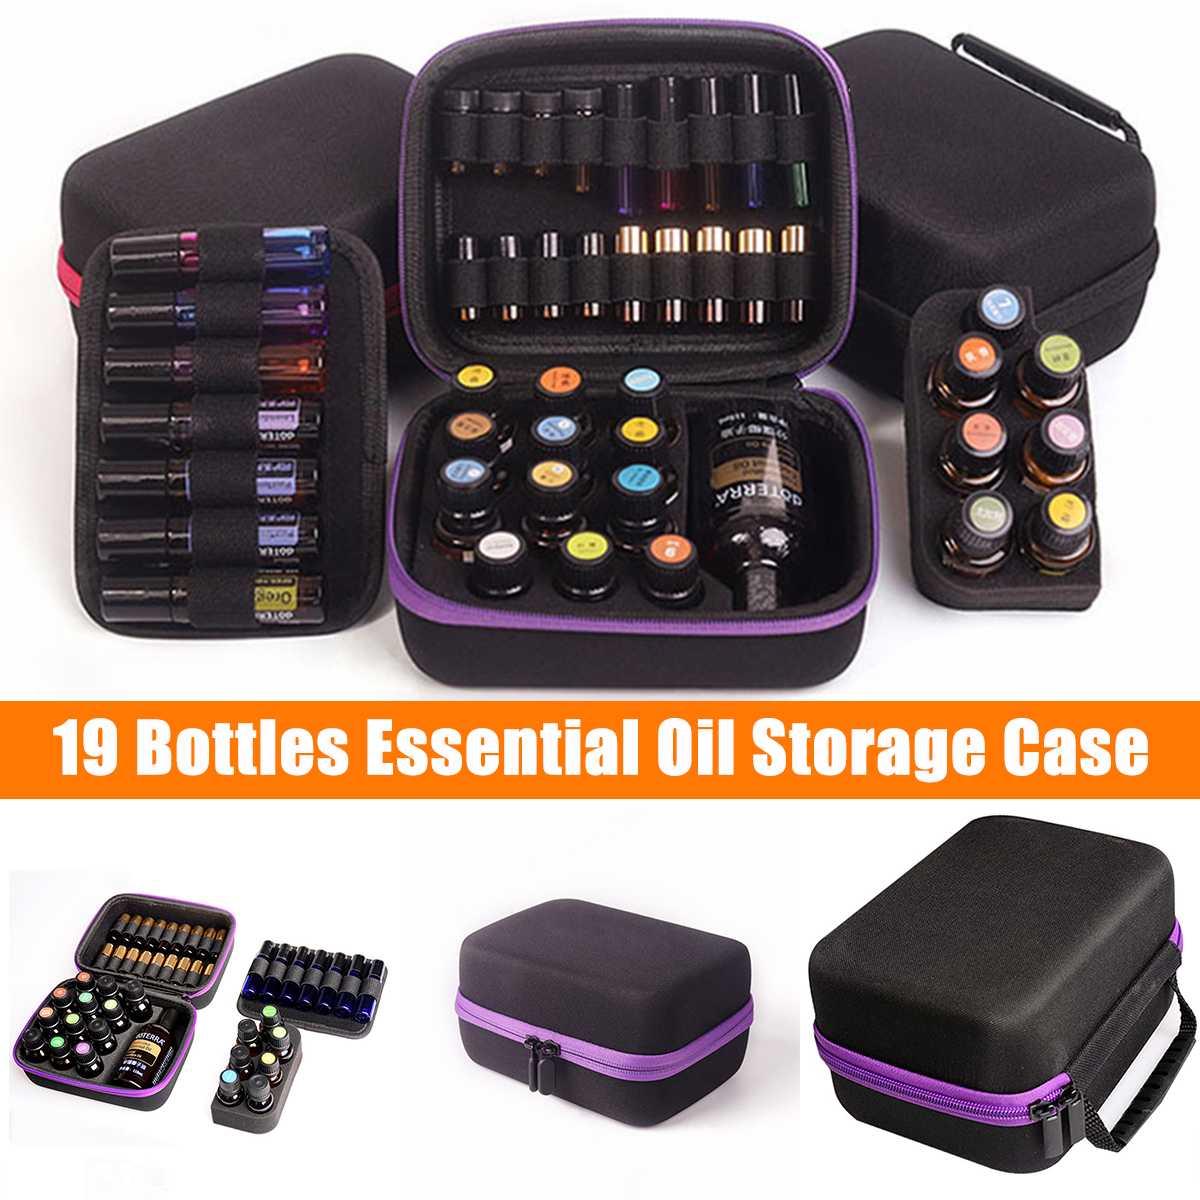 Bolsa de almacenamiento de aceite esencial 19 botellas 5ML 10ML 15ML portátil de viaje Perfume botella de aceite esencial organizador bolsa de recogida